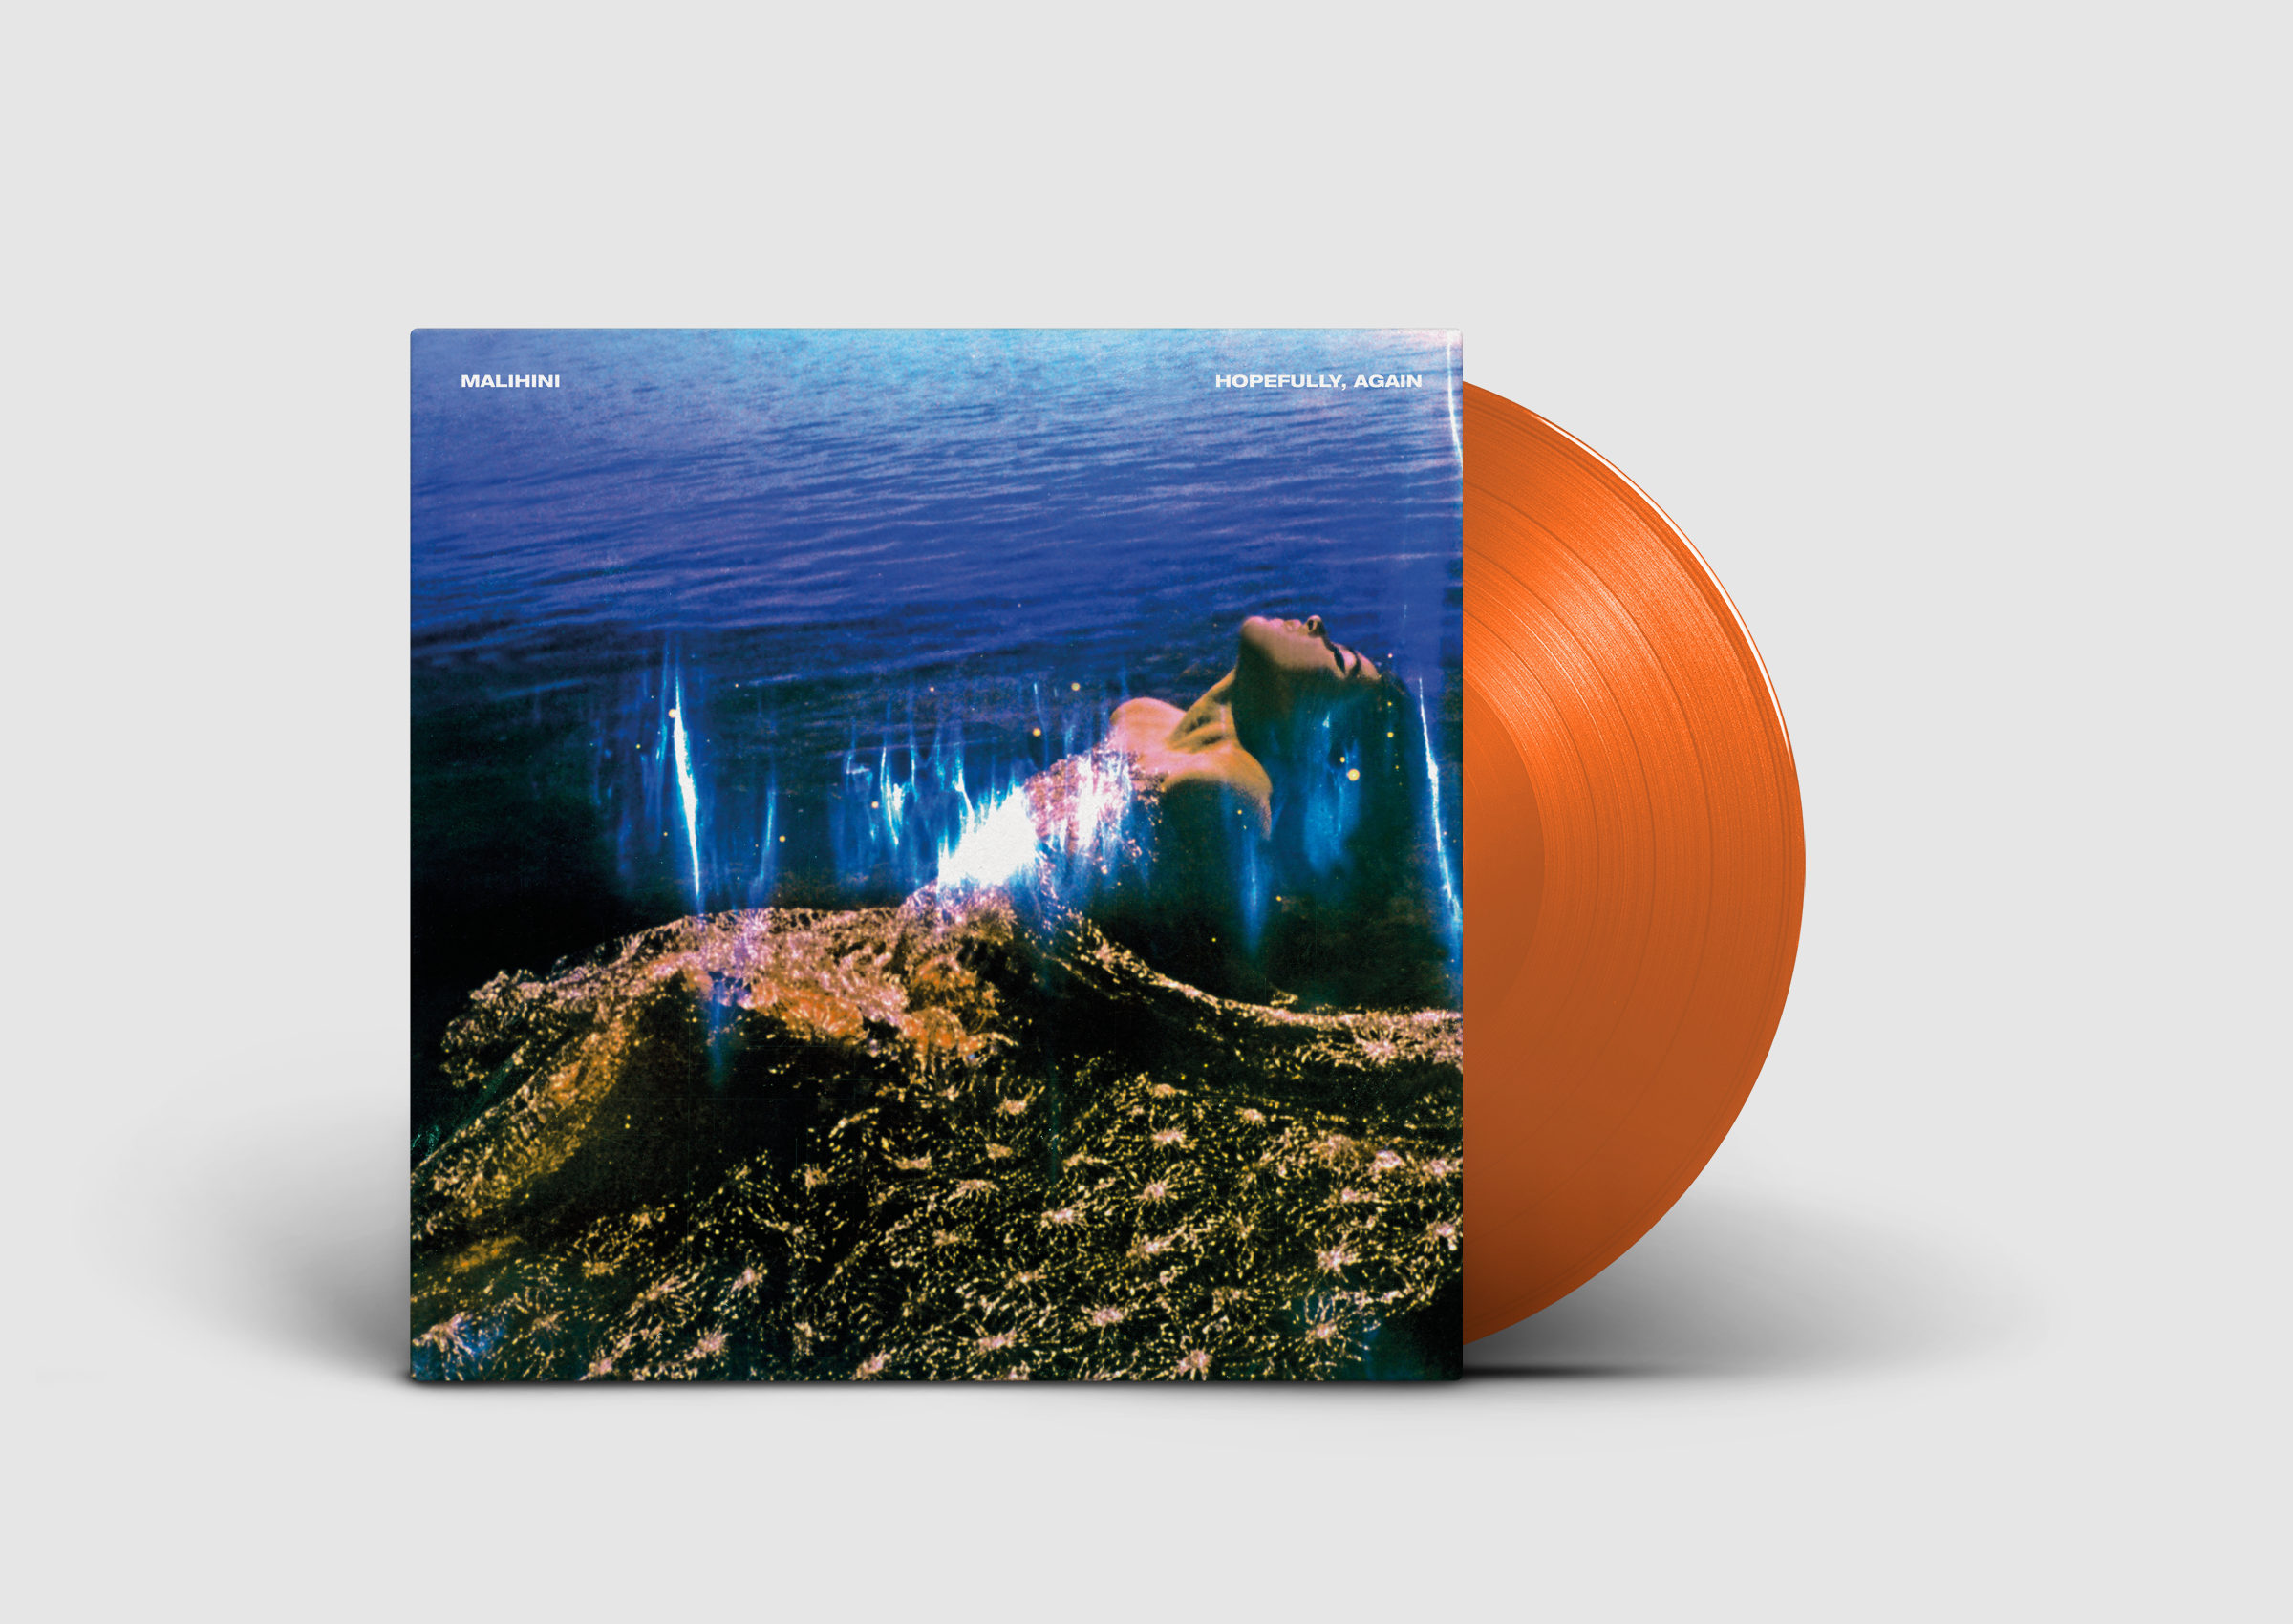 'Hopefully, Again' signed orange vinyl (includes instant download of title track) - malihini